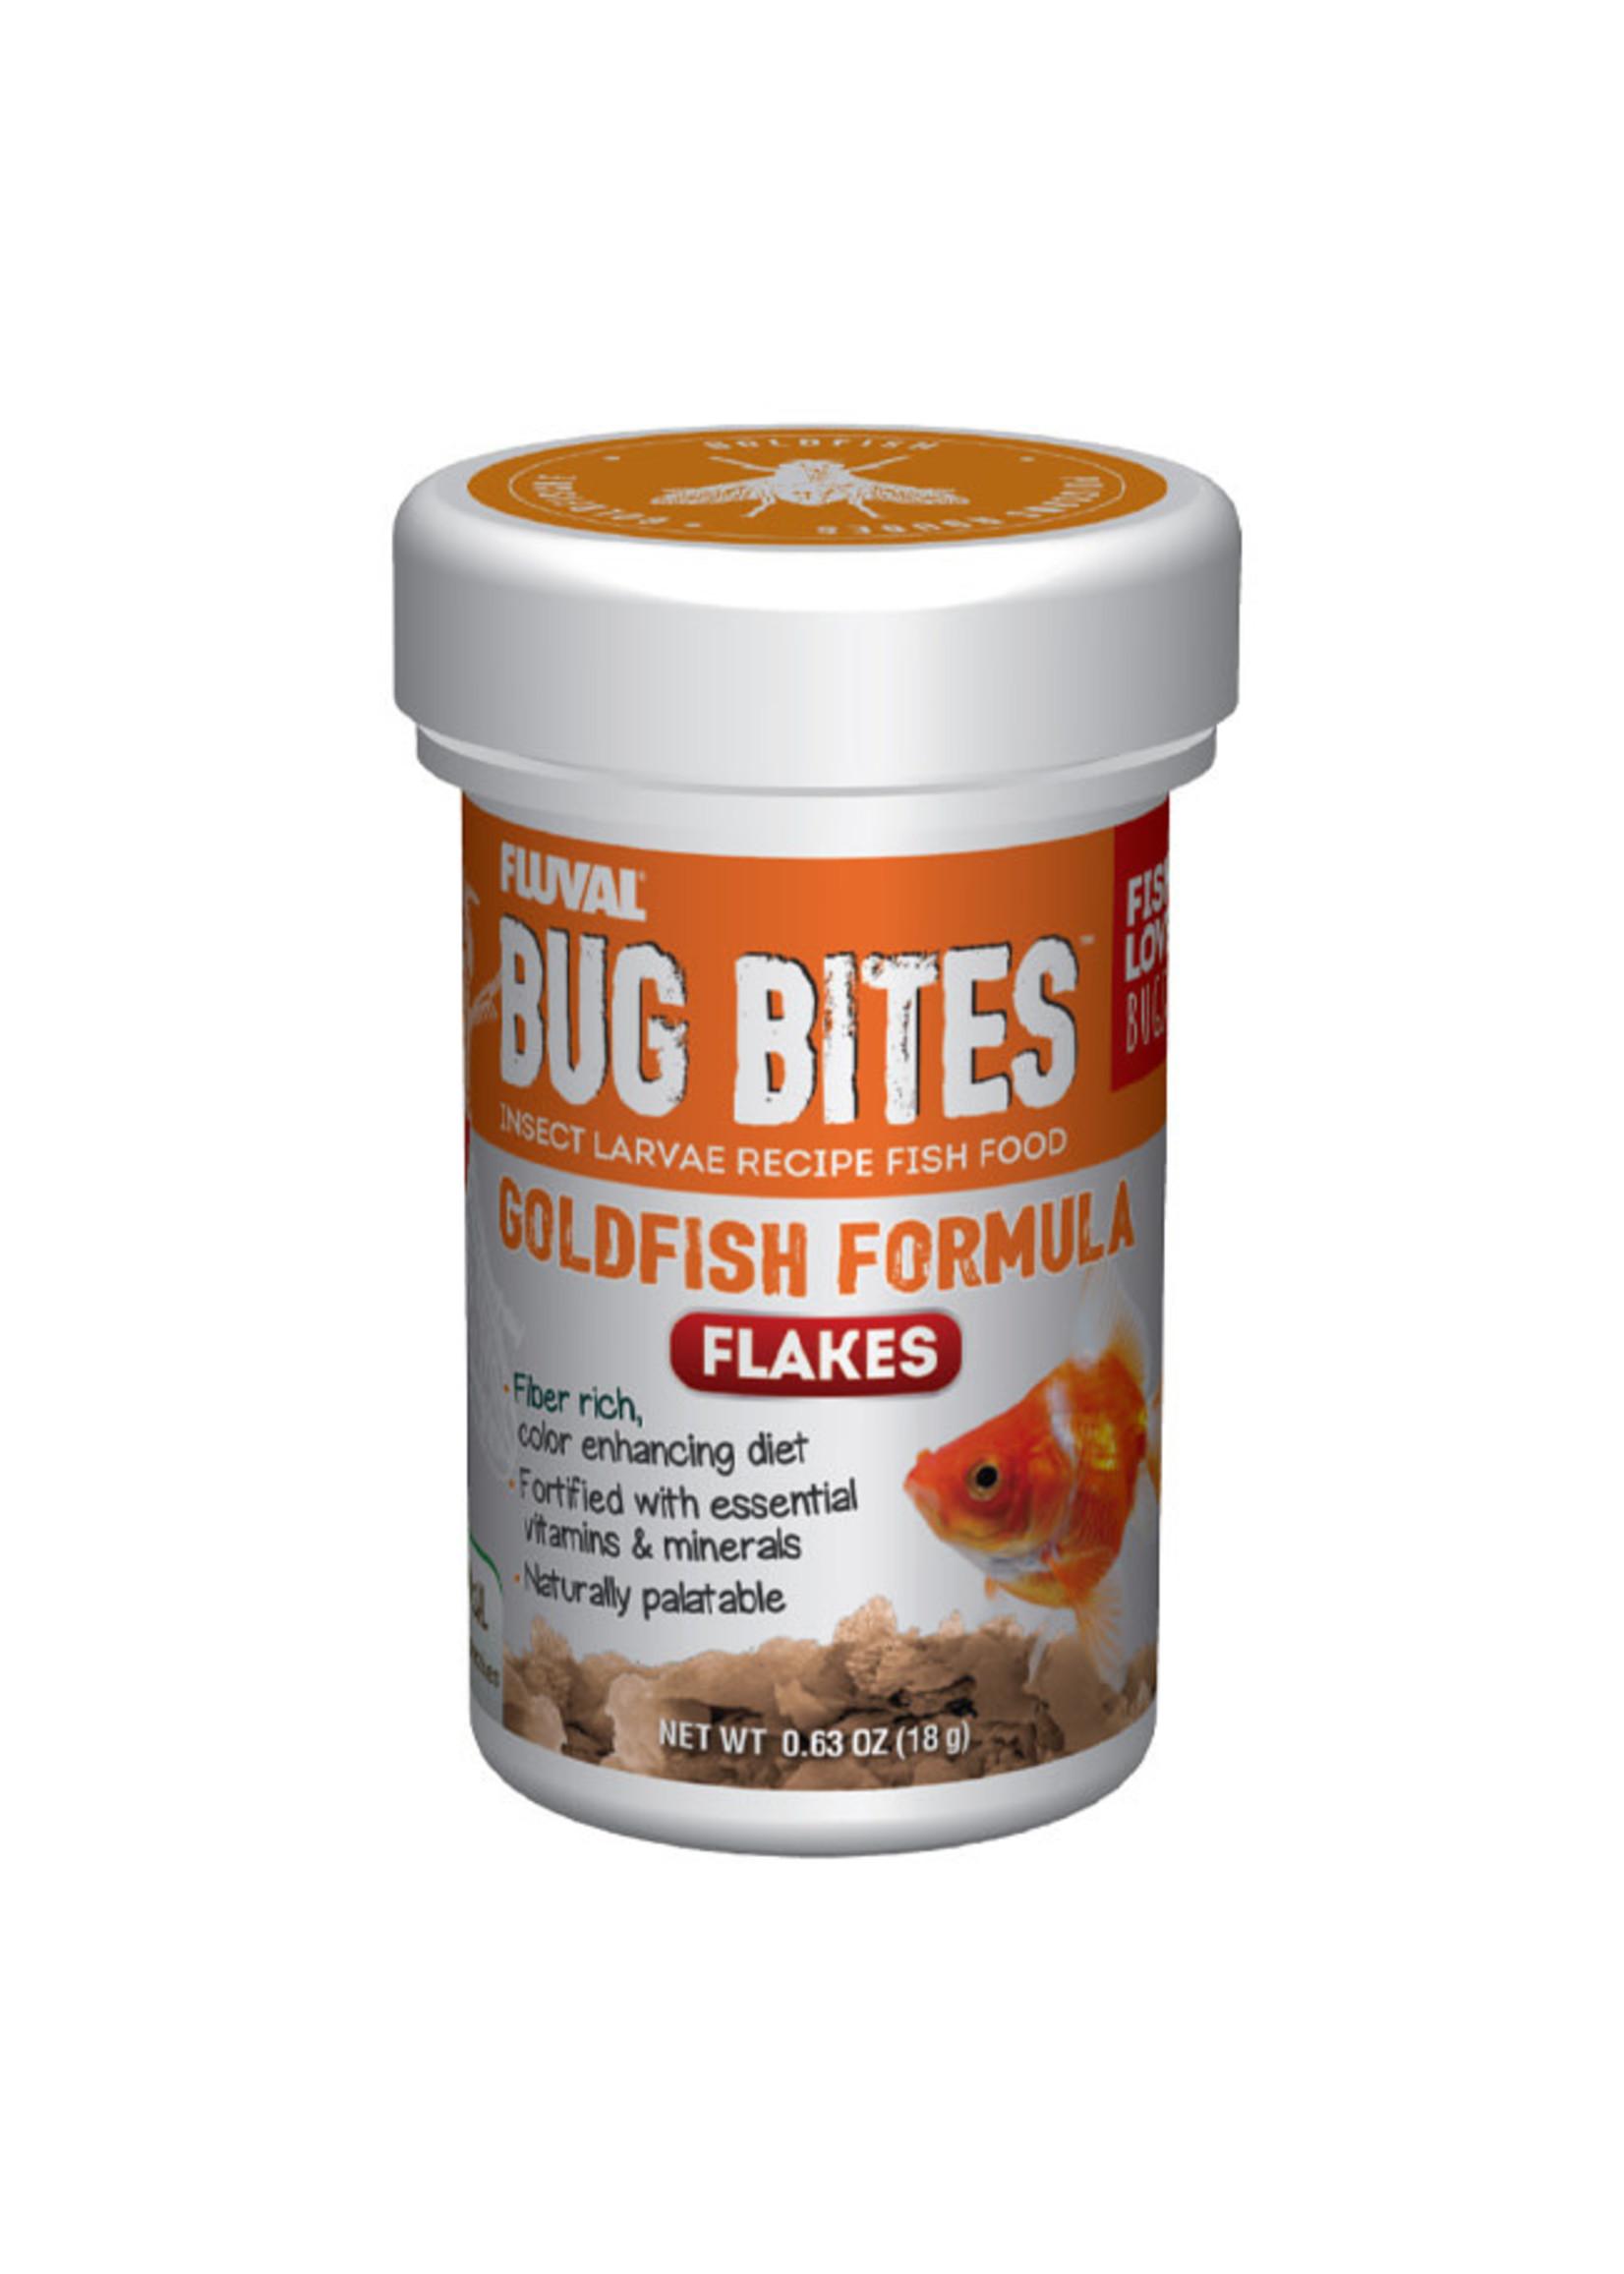 Fluval Fluval Bug Bites Goldfish Flakes